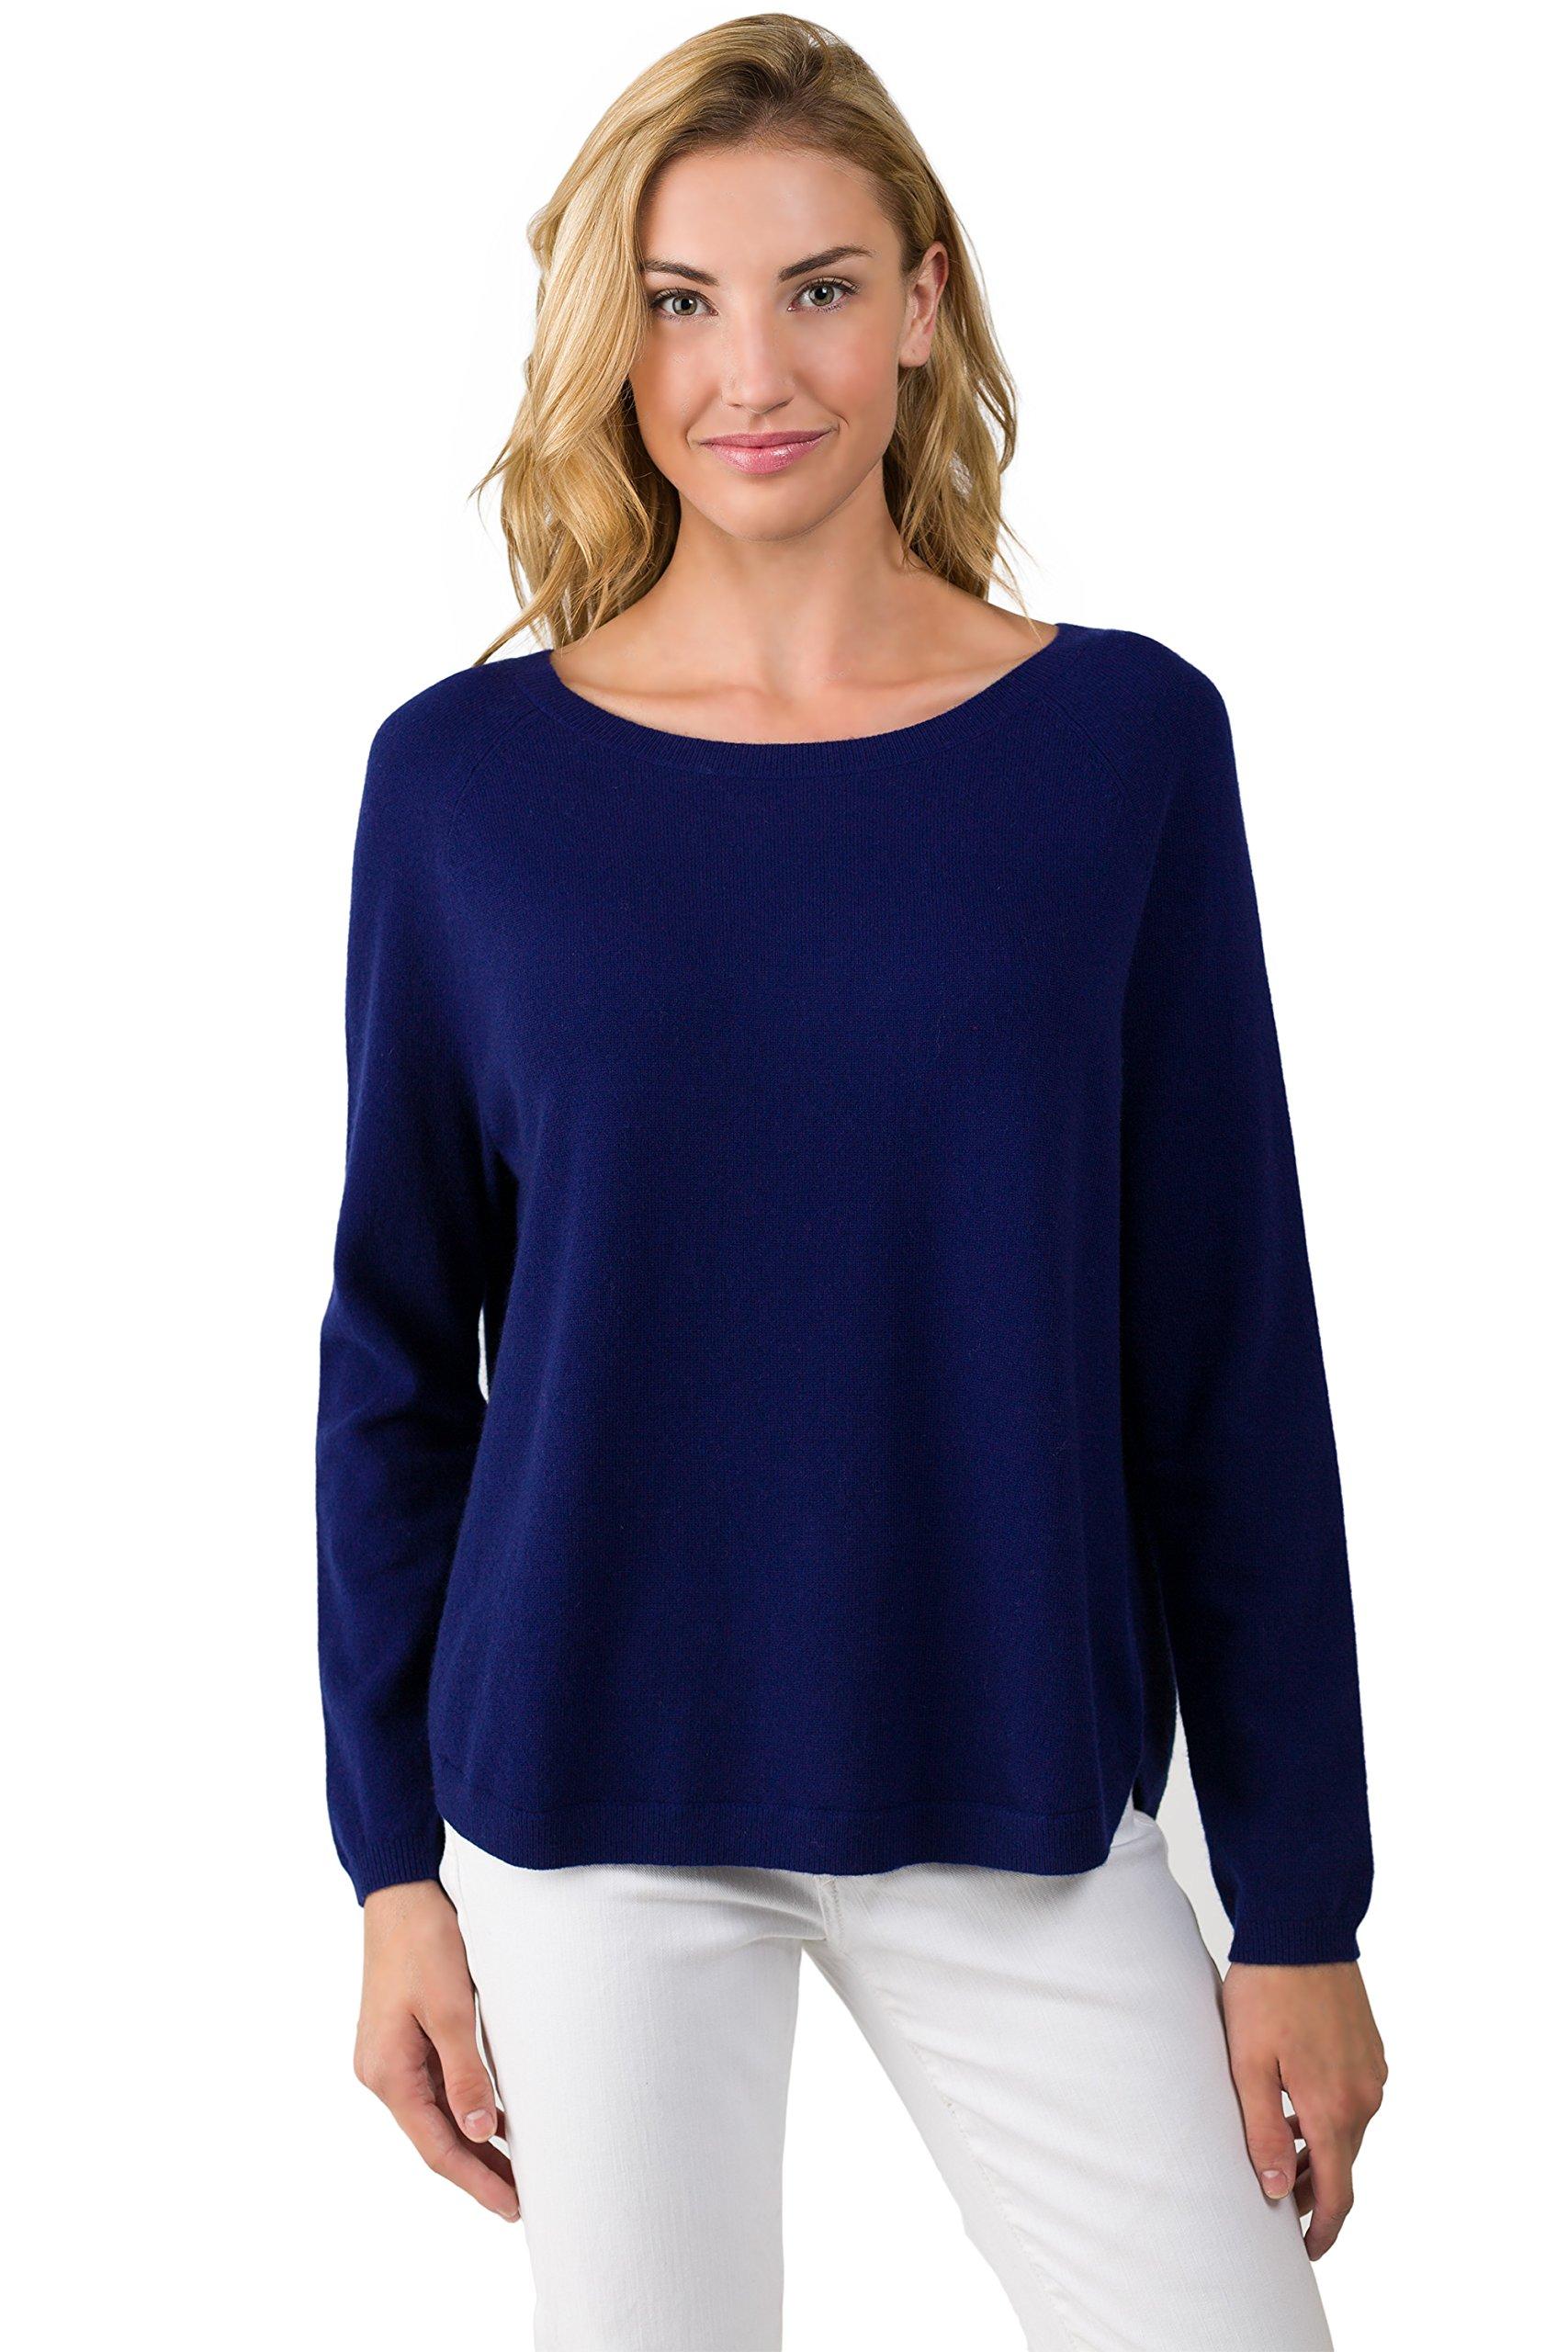 J CASHMERE Women's 100% Cashmere Oversized Long Sleeve Raglan Boatneck Sweater